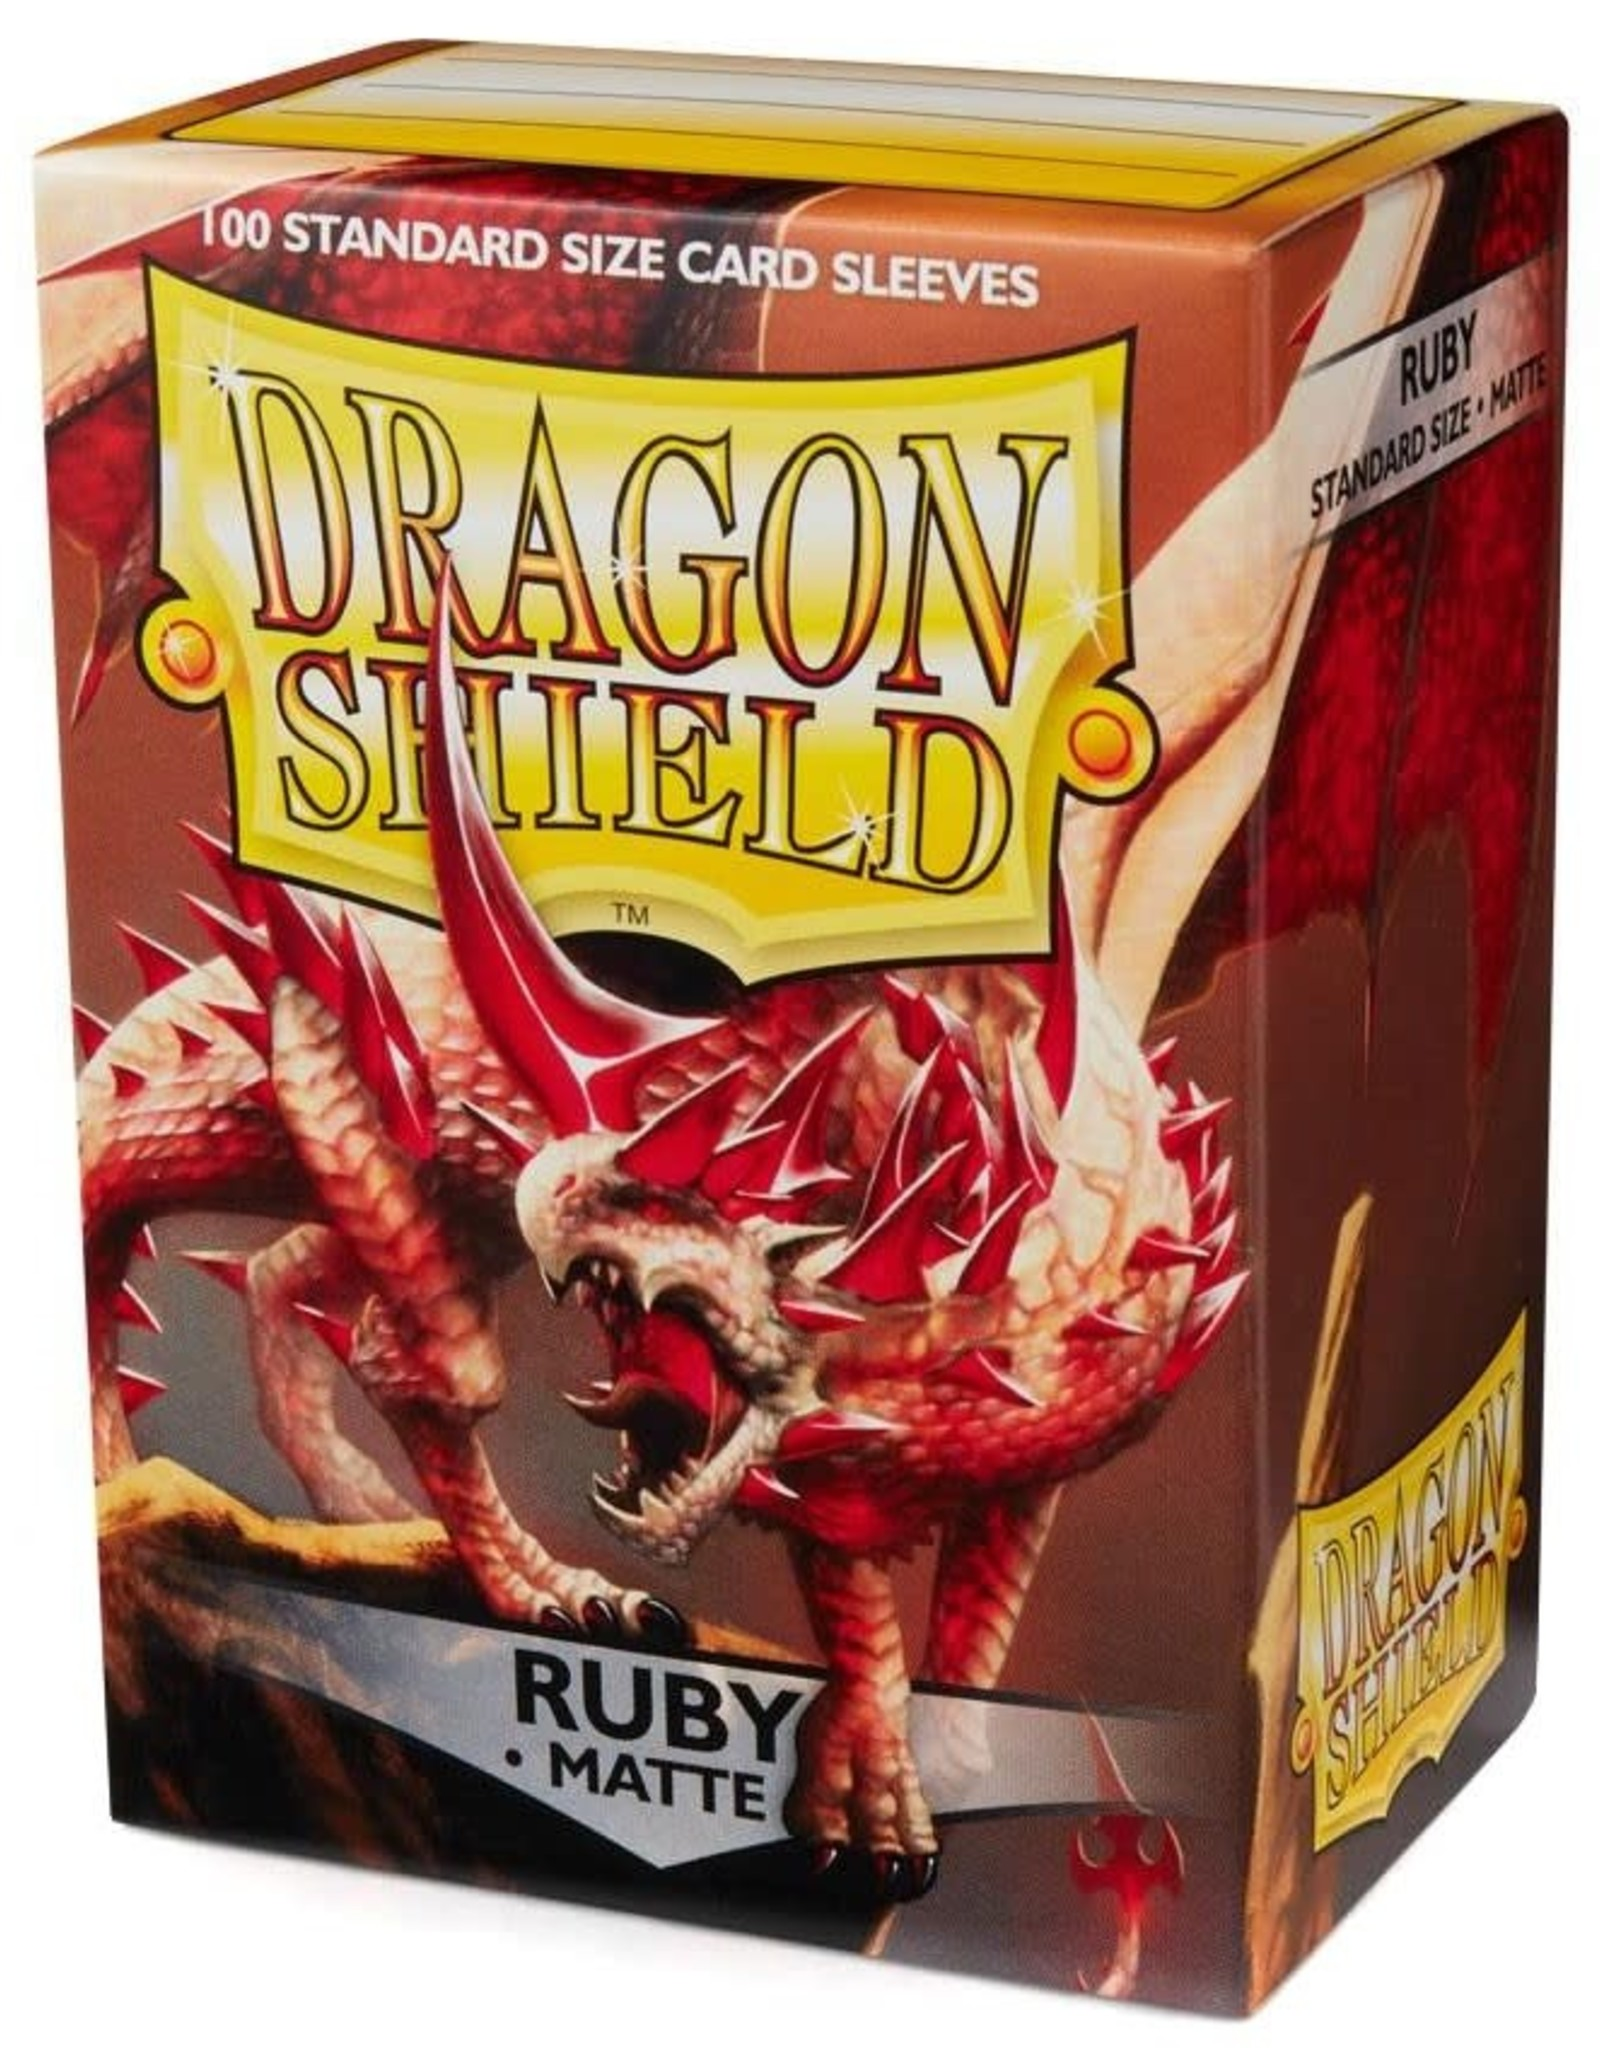 Arcane Tinmen Dragon Shields Sleeves: Matte Ruby 100ct